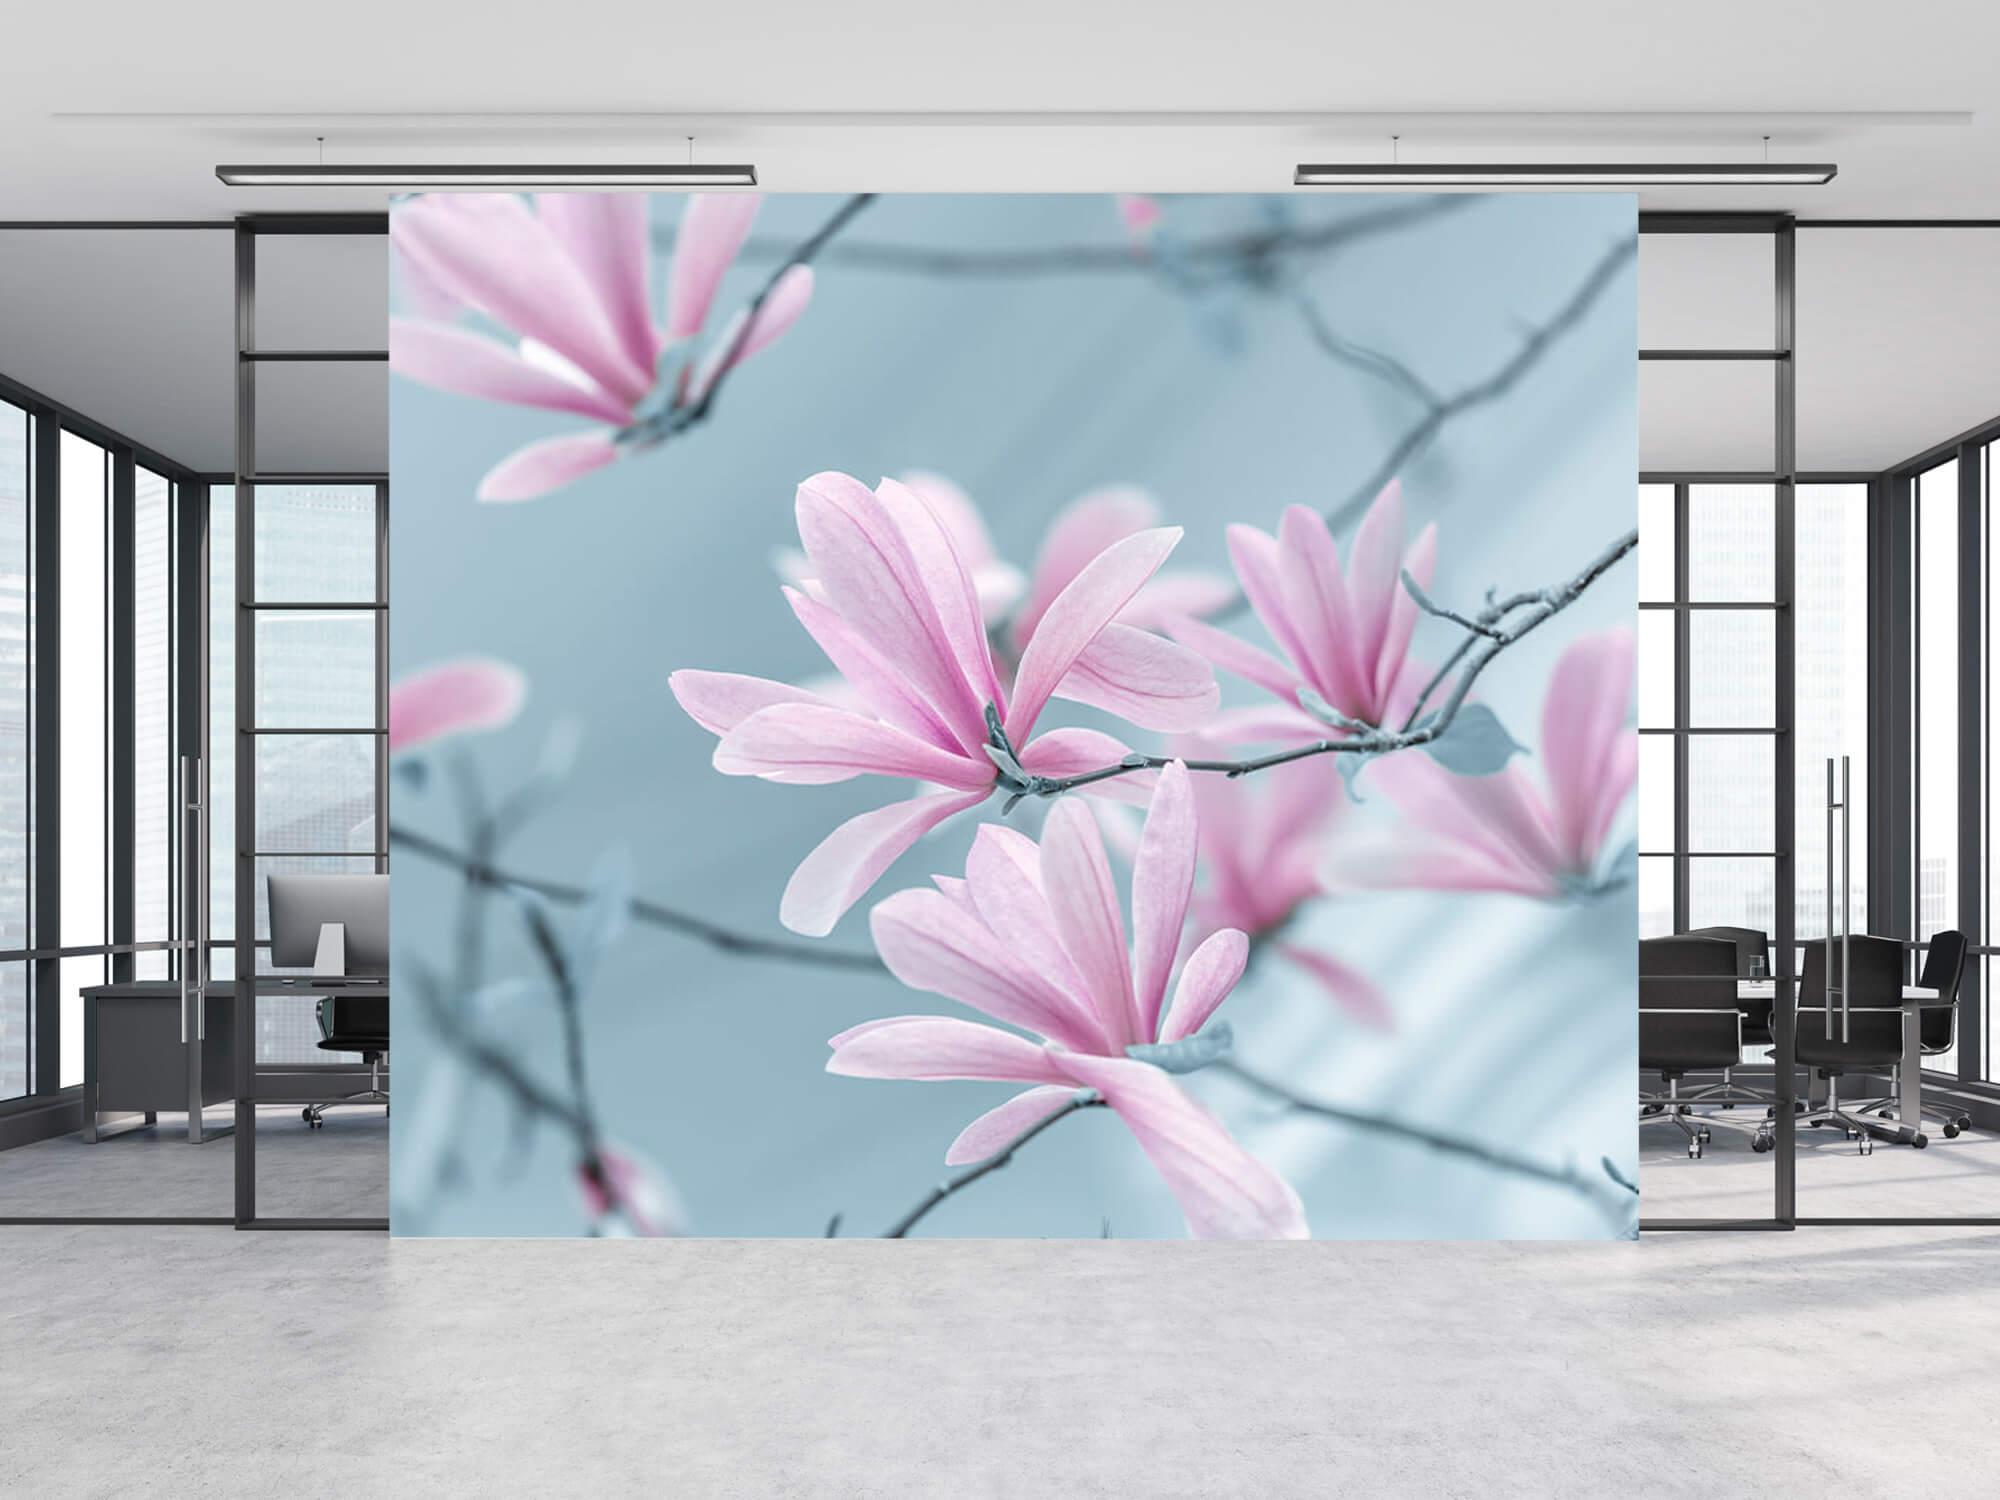 Magnolia bloemen 5